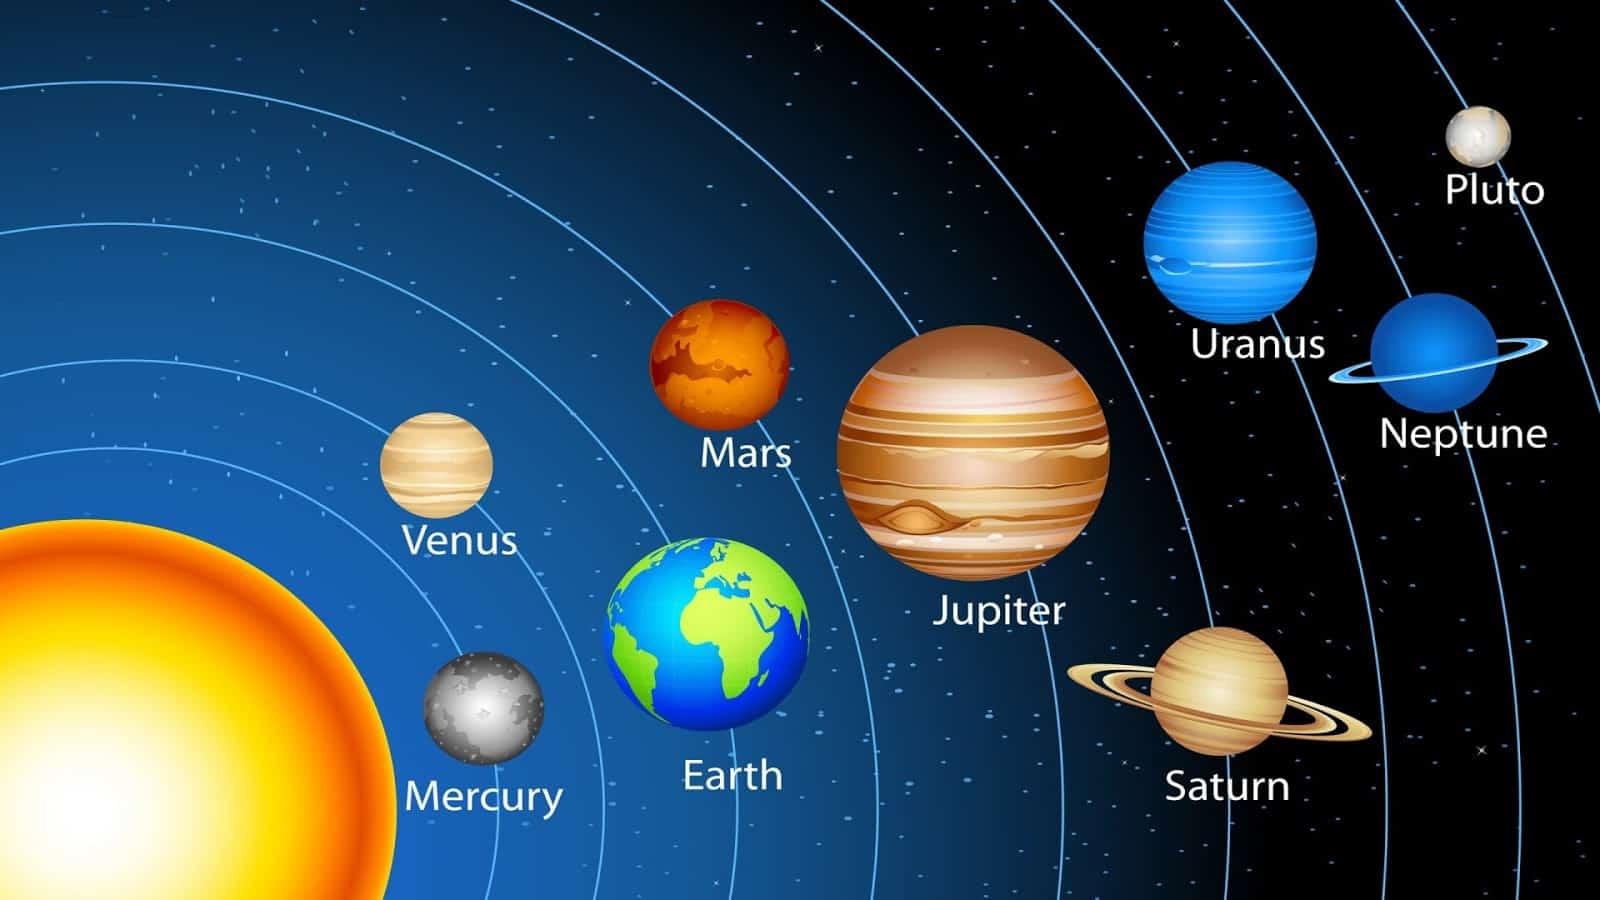 budh grah in solar system